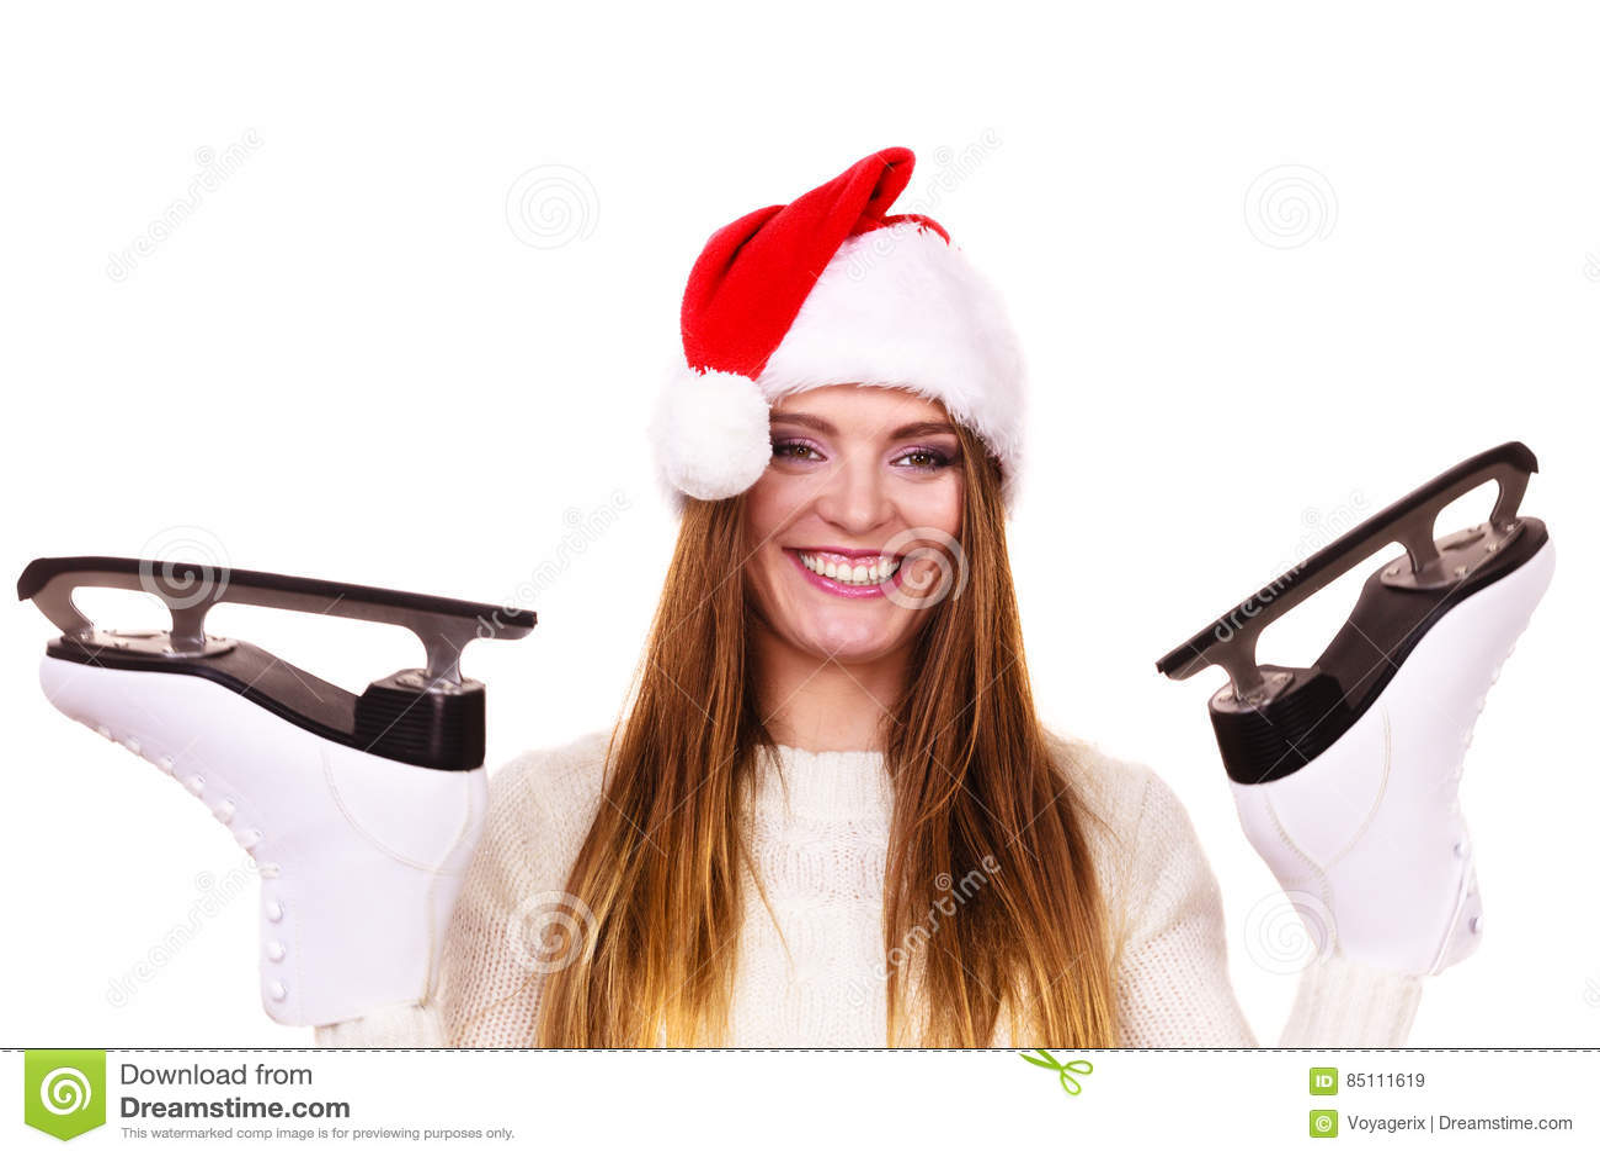 68466fb1913 Woman Santa Claus With Ice Skates Stock Image - Image of woman ...